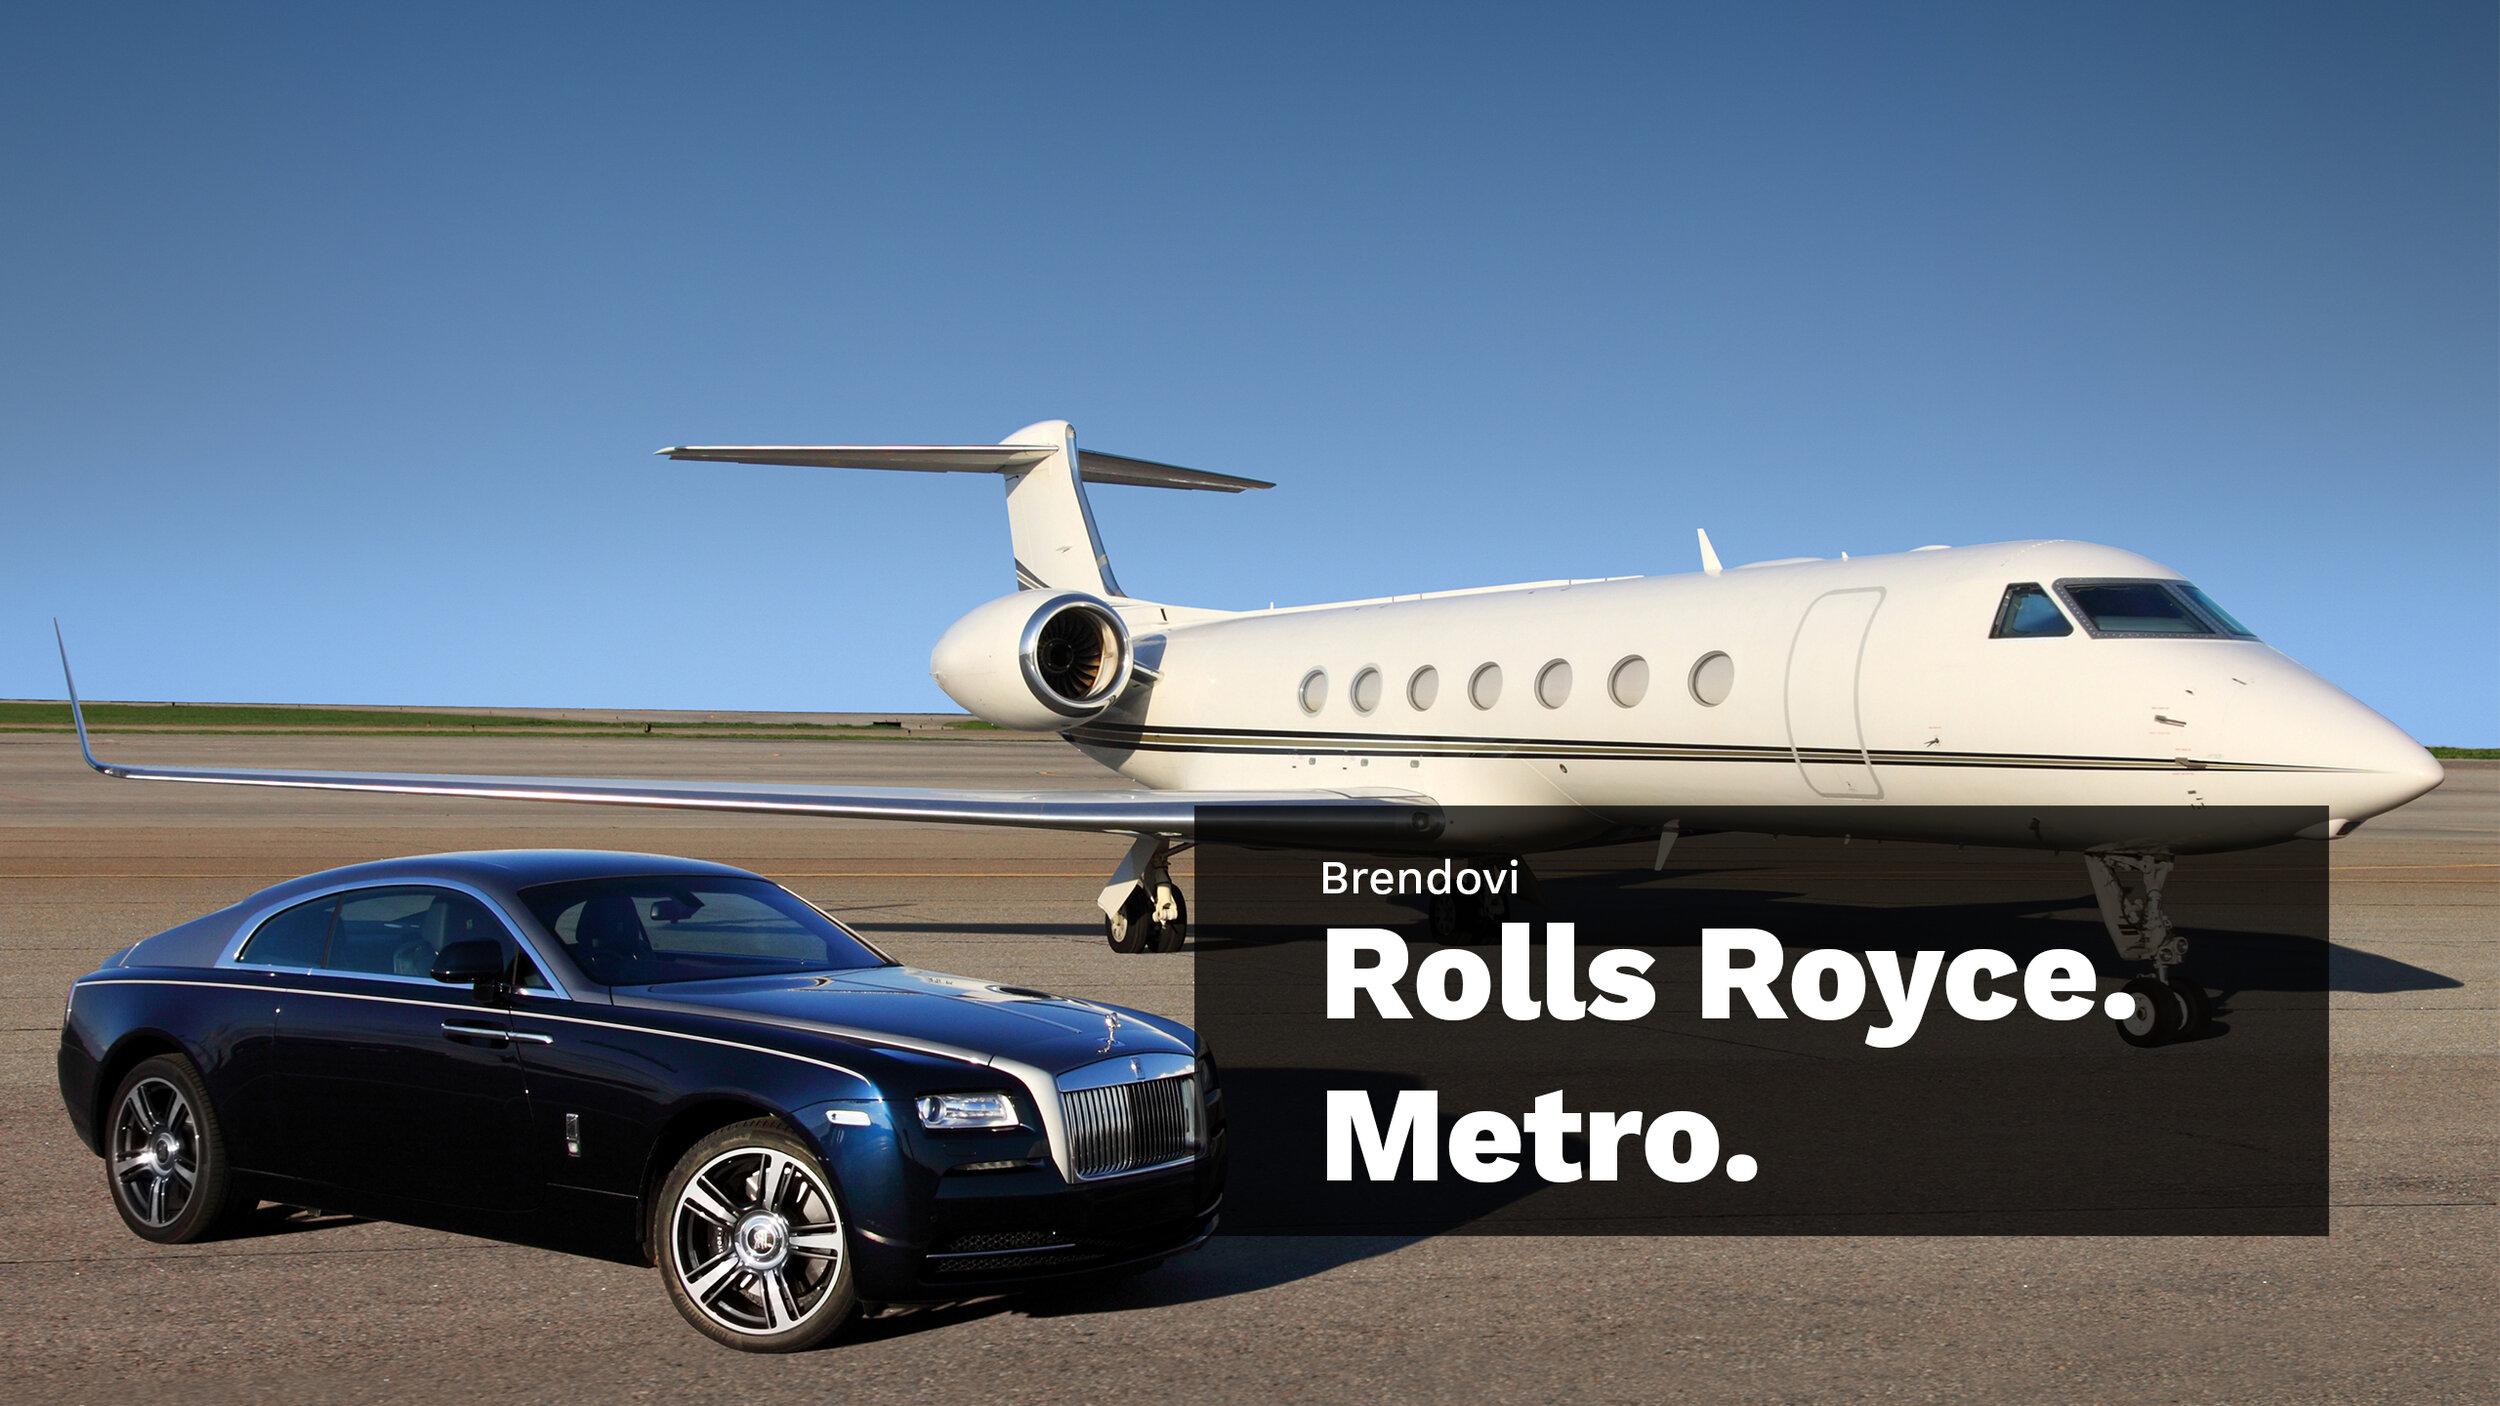 Rolls Royce. Metro